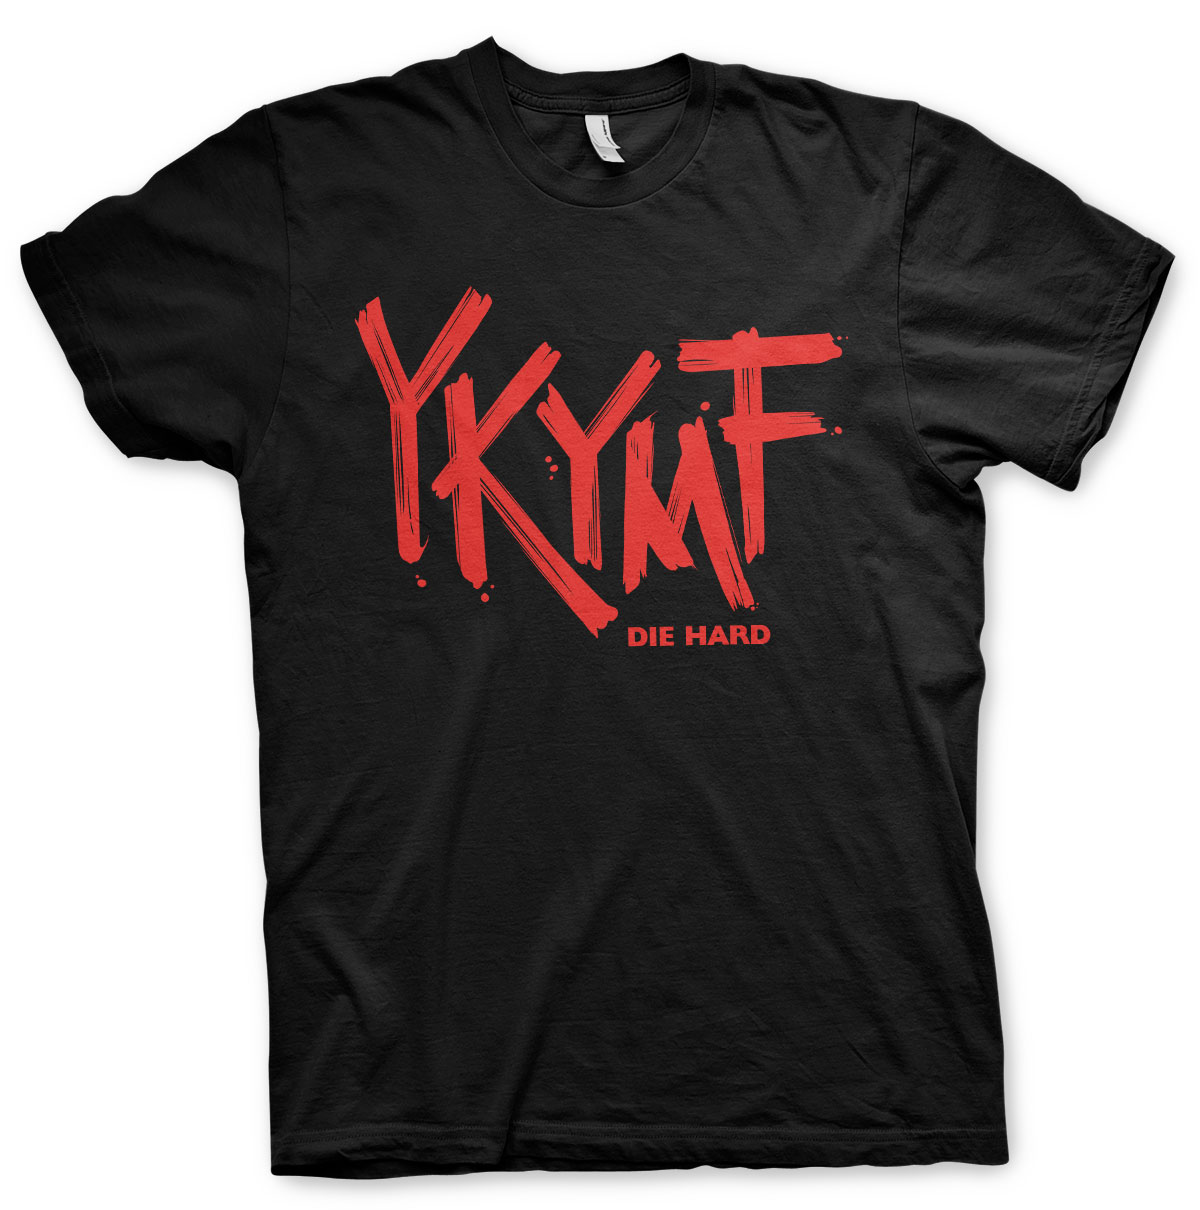 die-hard-ykymf-t-shirt